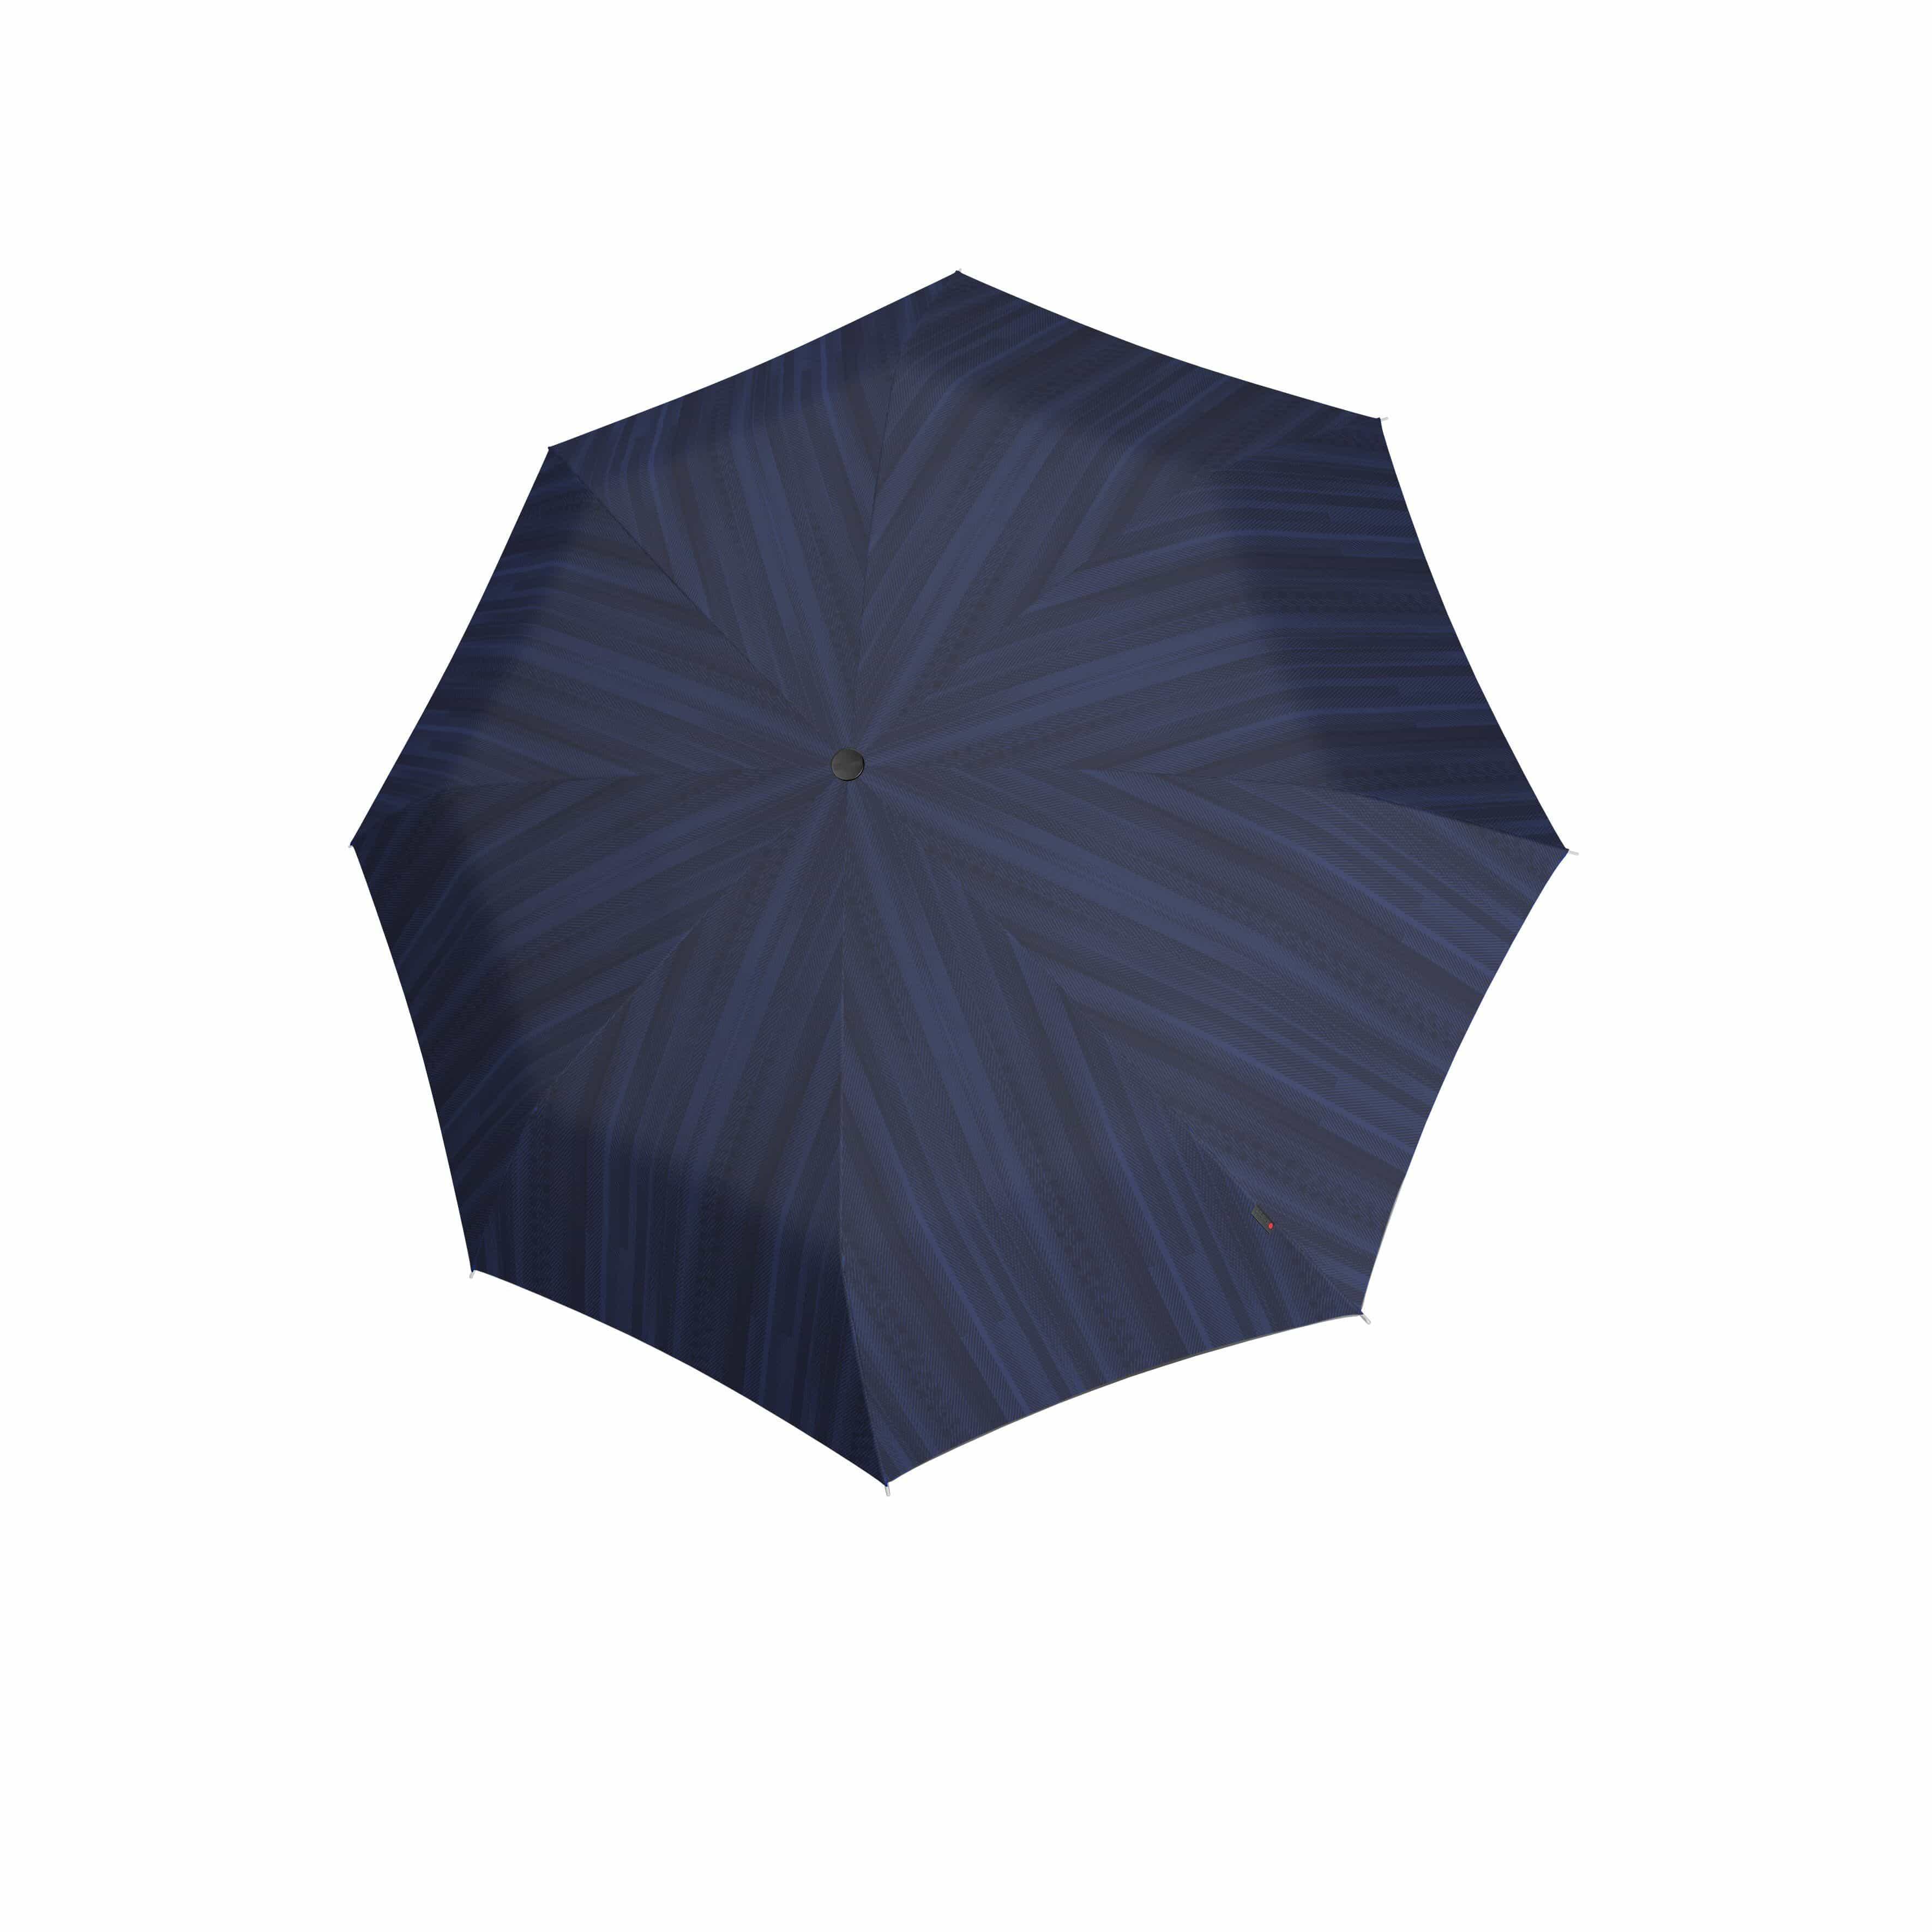 Knirps Umbrella Knirps T.200 medium duomatic power blue ecorepel